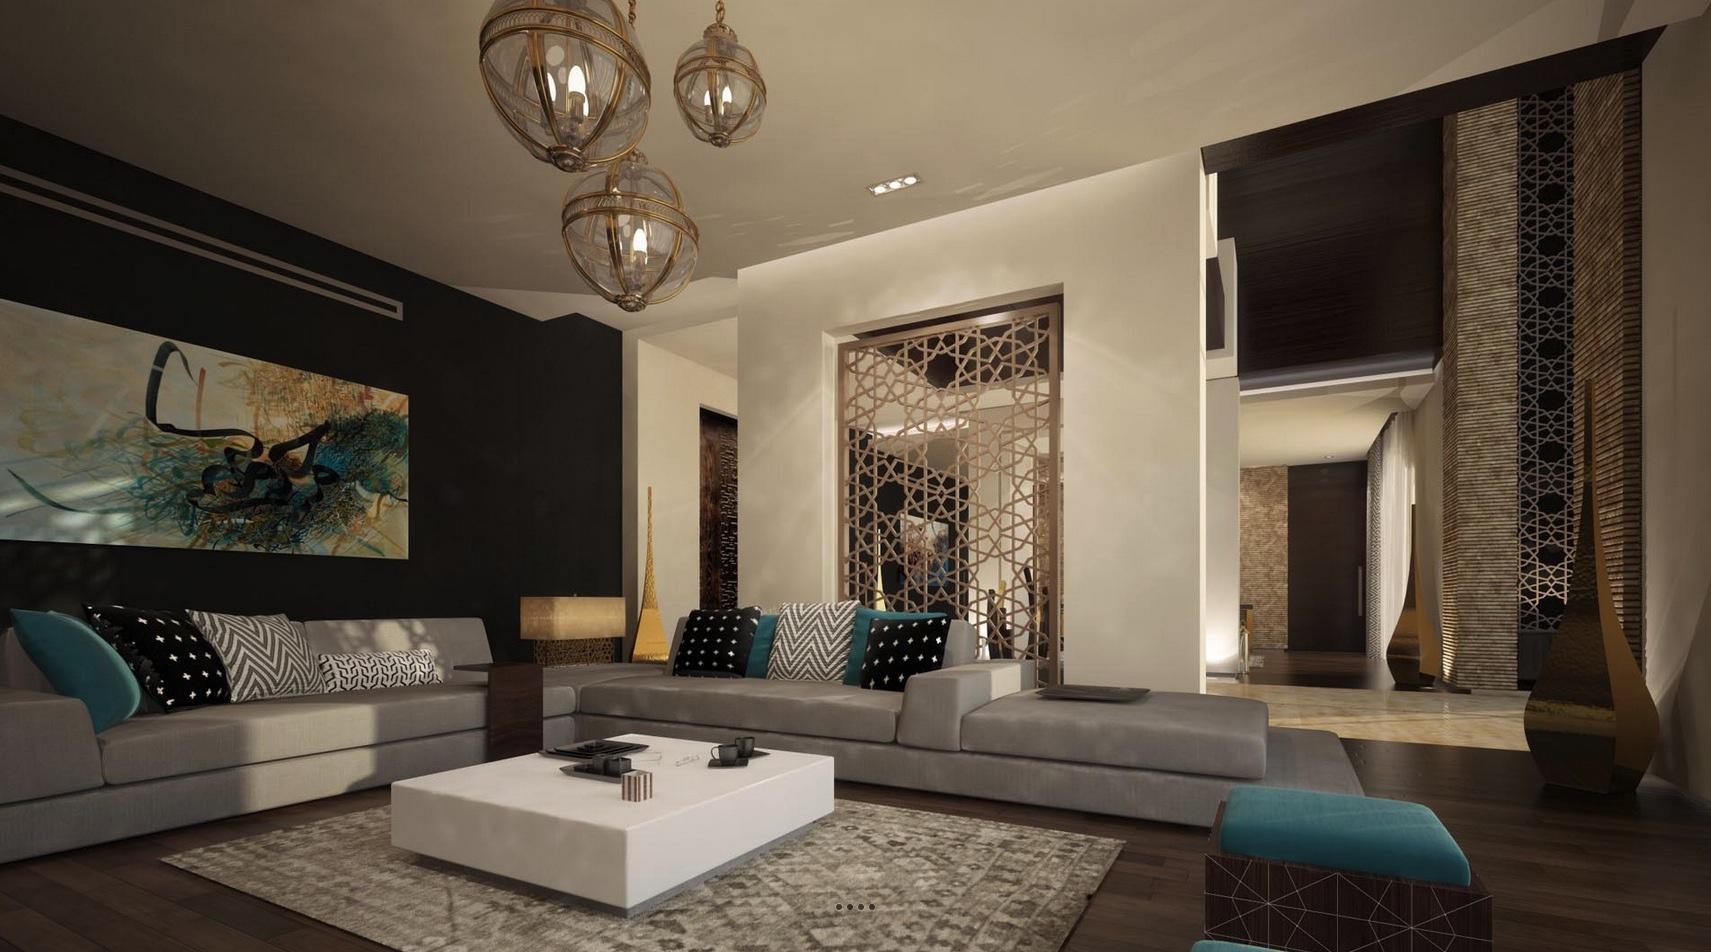 Sunken Living Room Design Interior Design Ideas